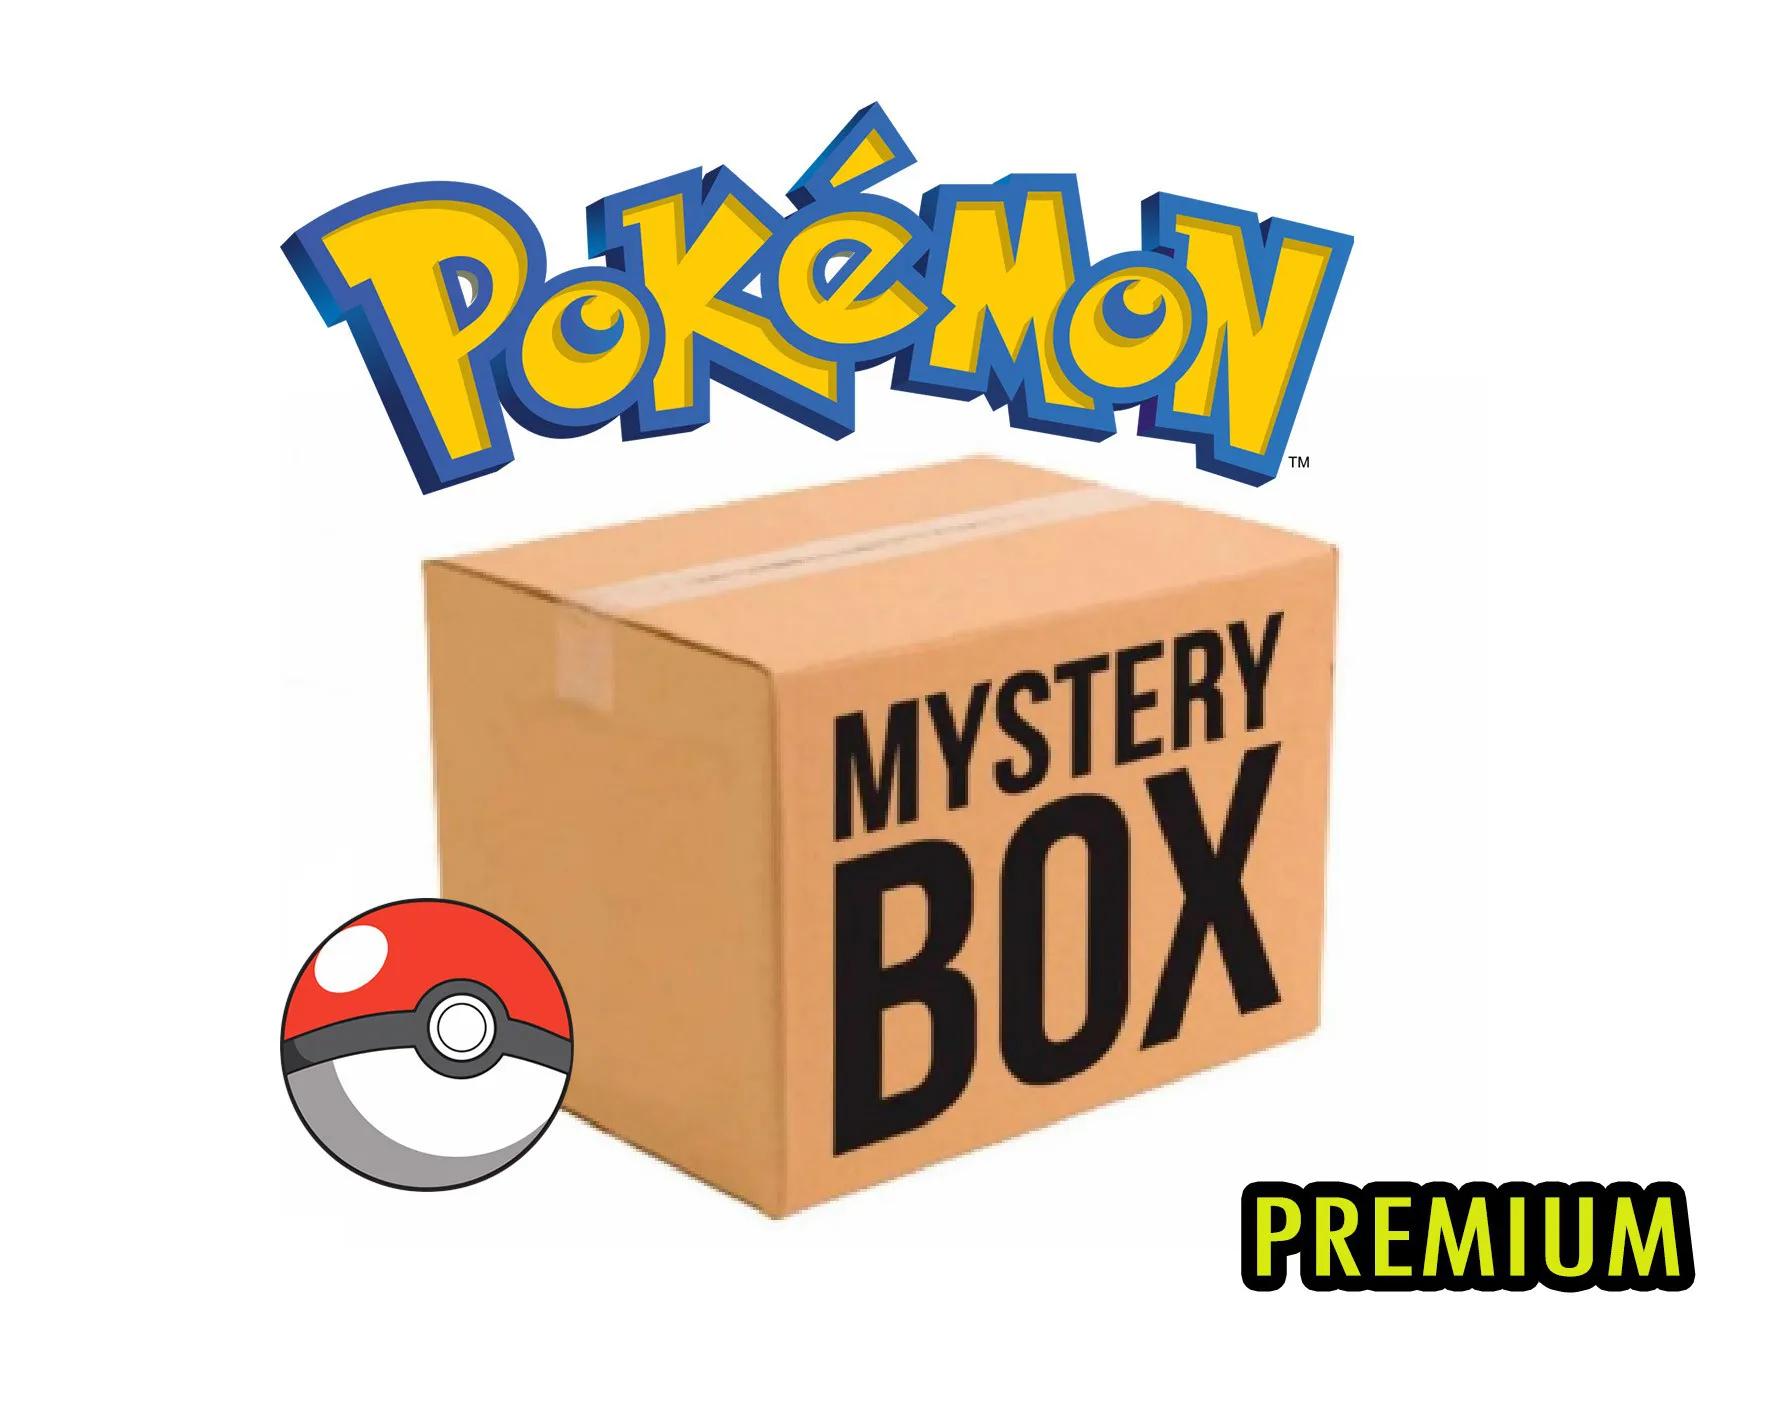 CAIXA MISTERIOSA MYSTERY BOX SURPRESA POKEMON PREMIUM